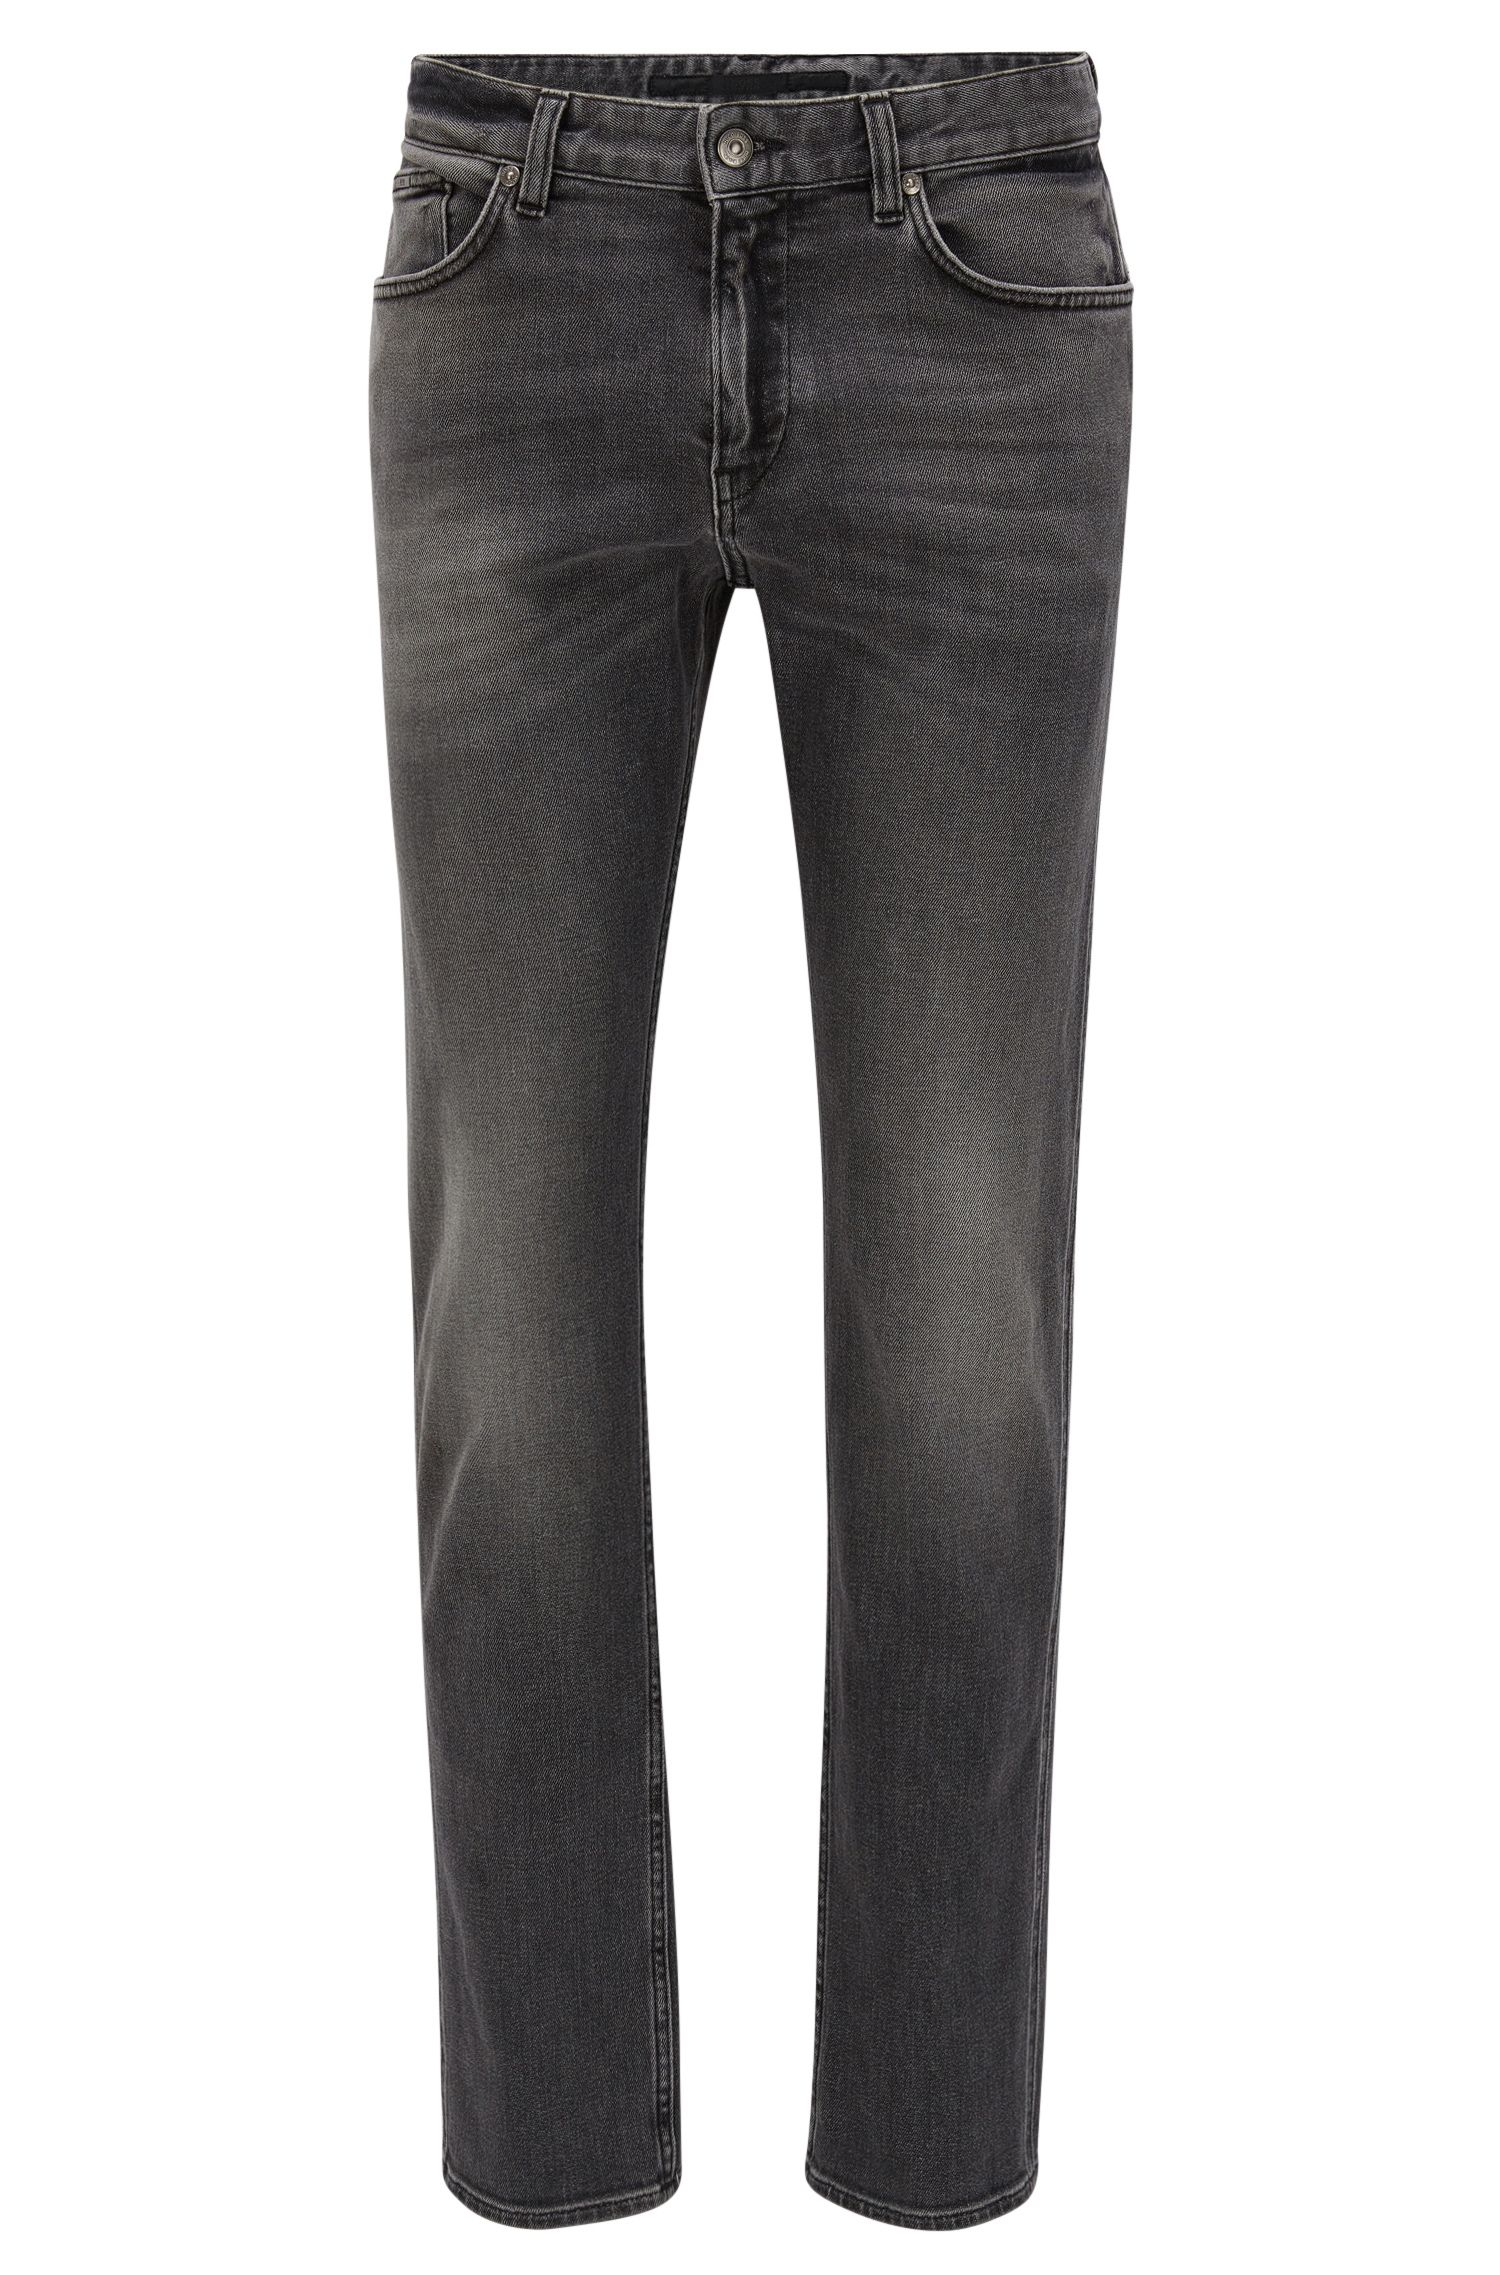 Grey slim-fit jeans in mid-washed stretch denim